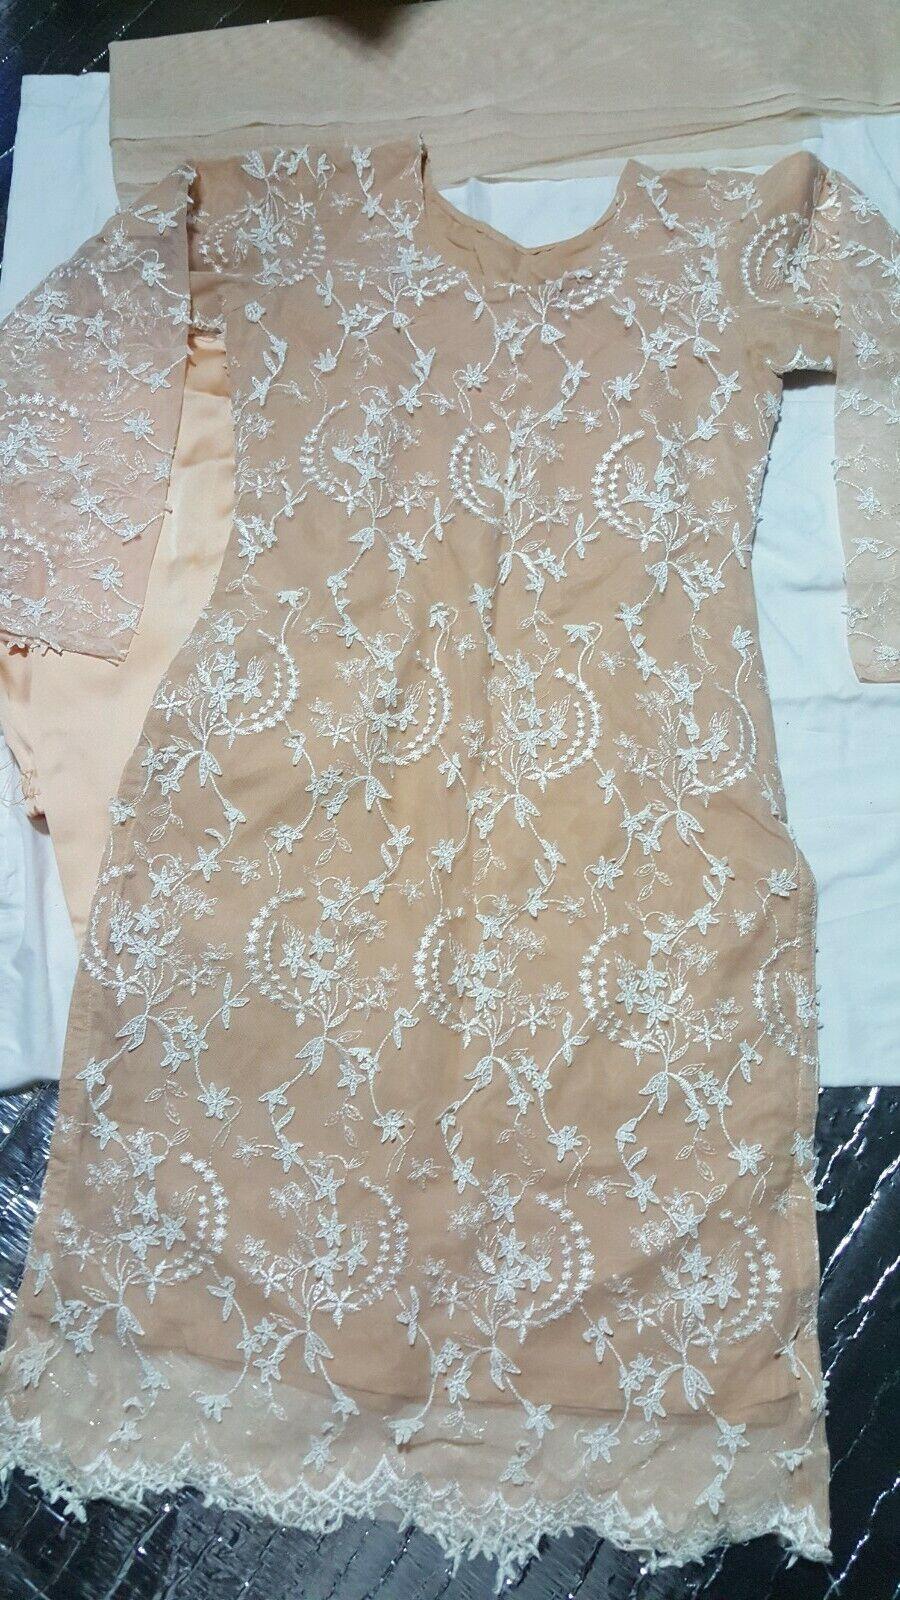 Indian Pakistani designer net fabric thread embroidery shalwar kameez size S